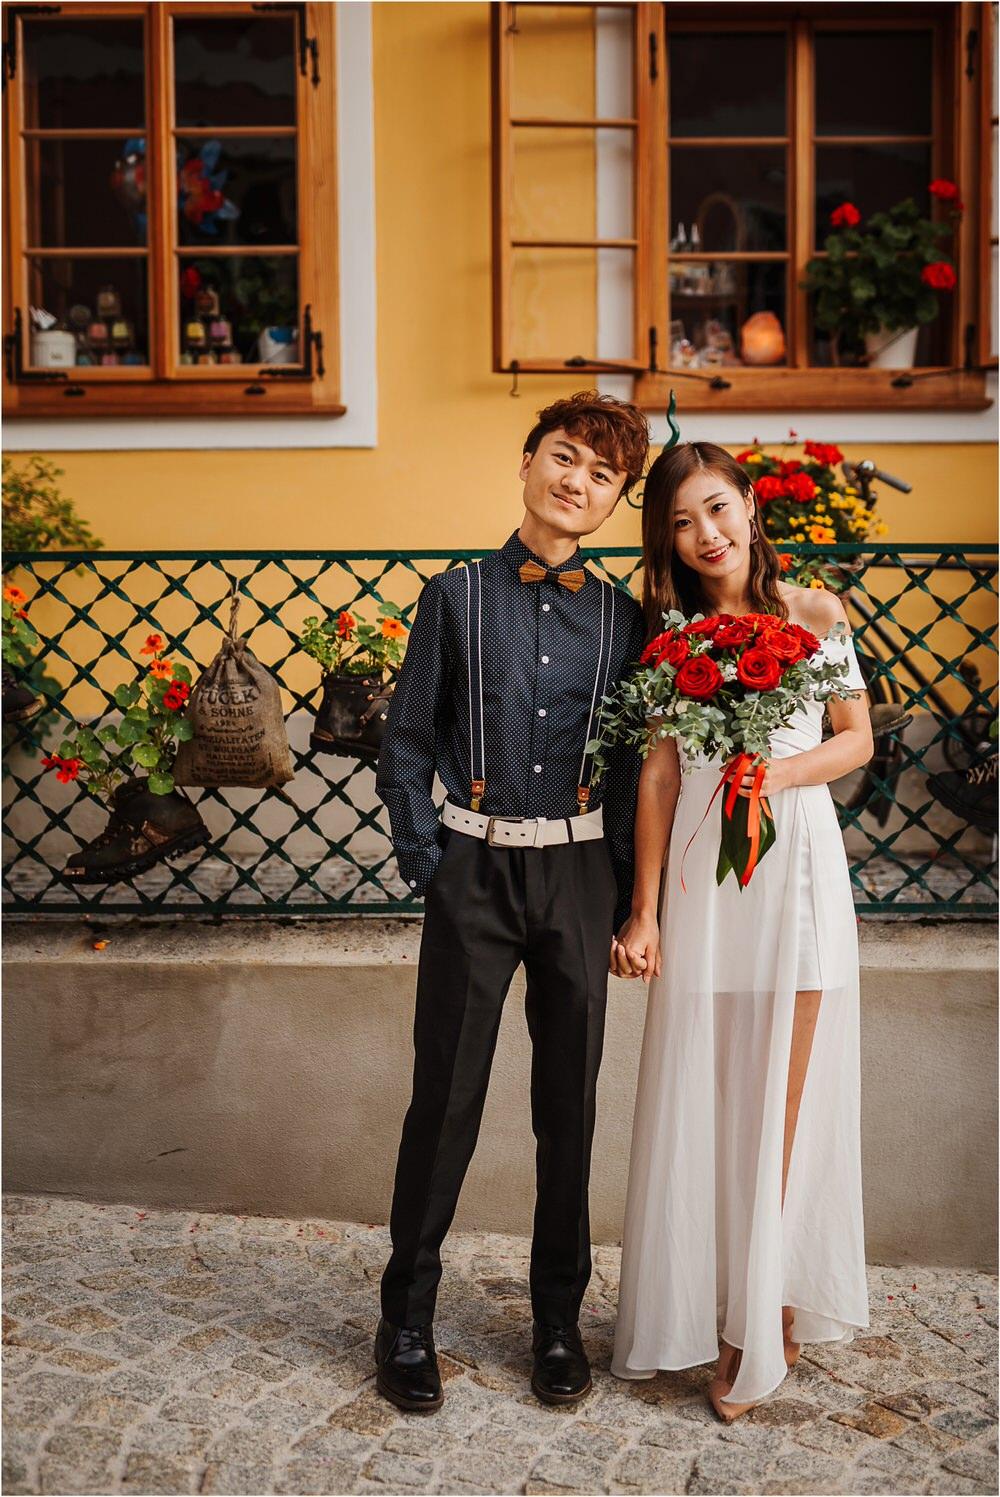 hallstatt austria wedding engagement photographer asian proposal surprise photography recommended nature professional 0020.jpg